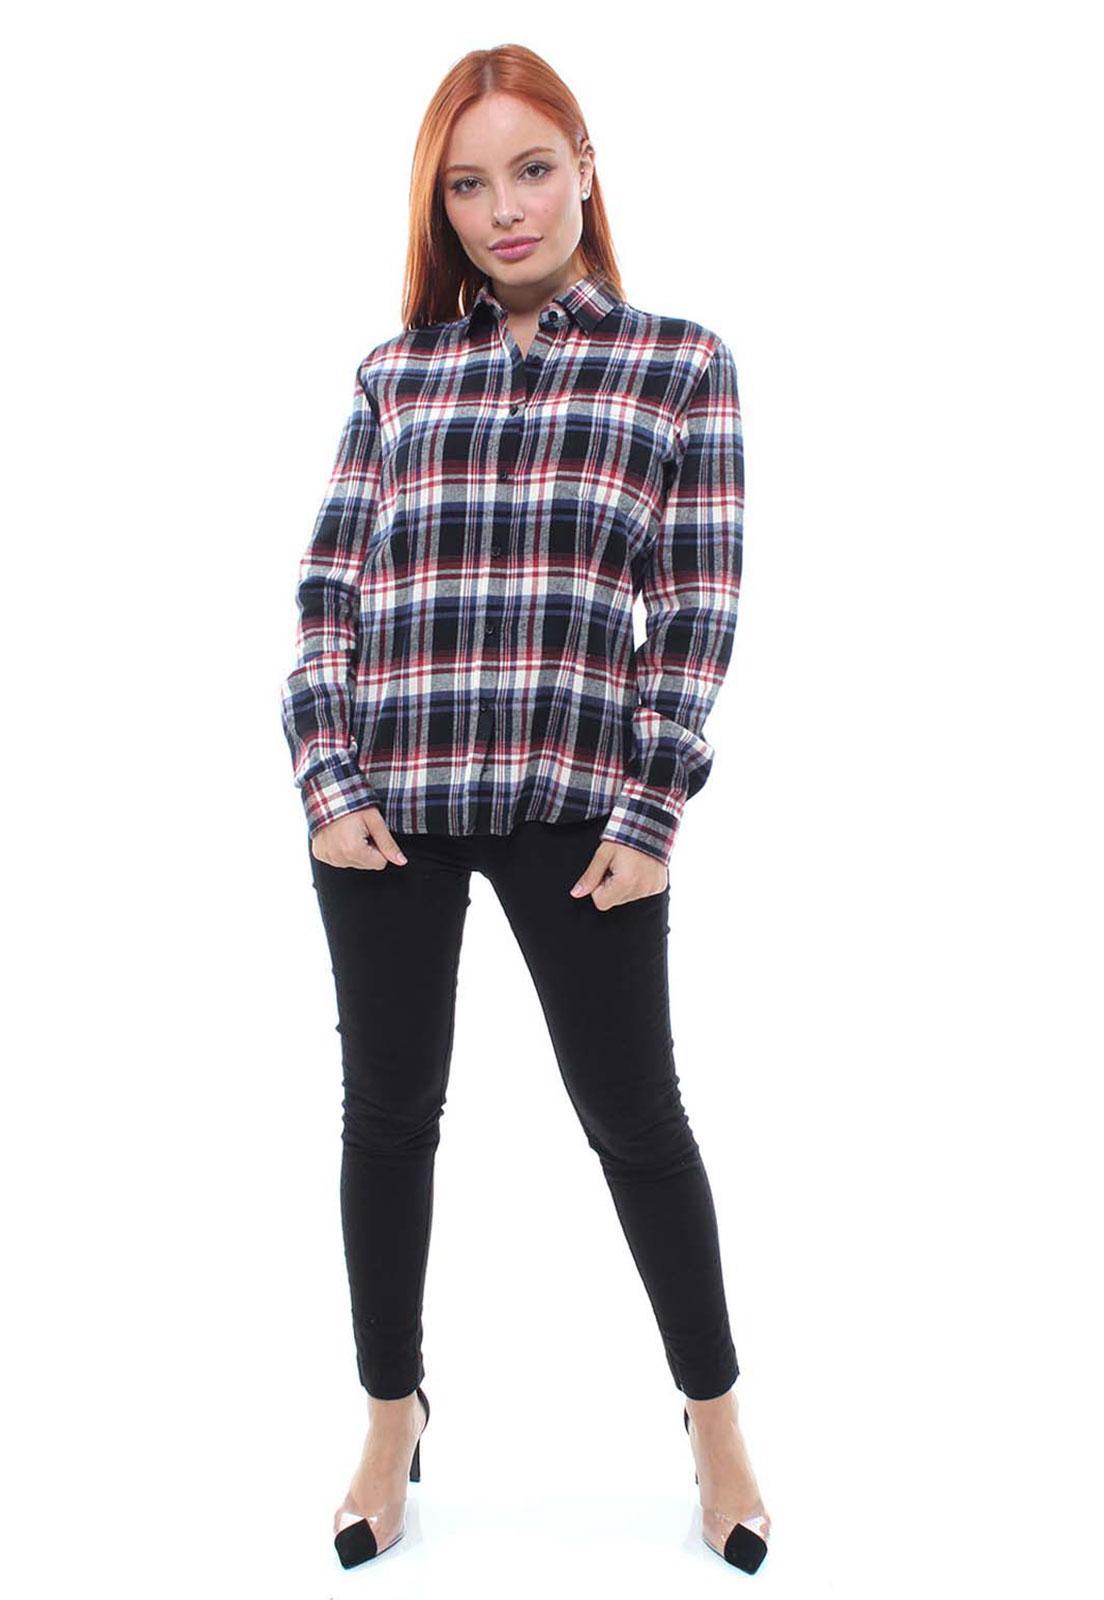 Camisa Flanelada Crocker - 47392  - CROCKER JEANS